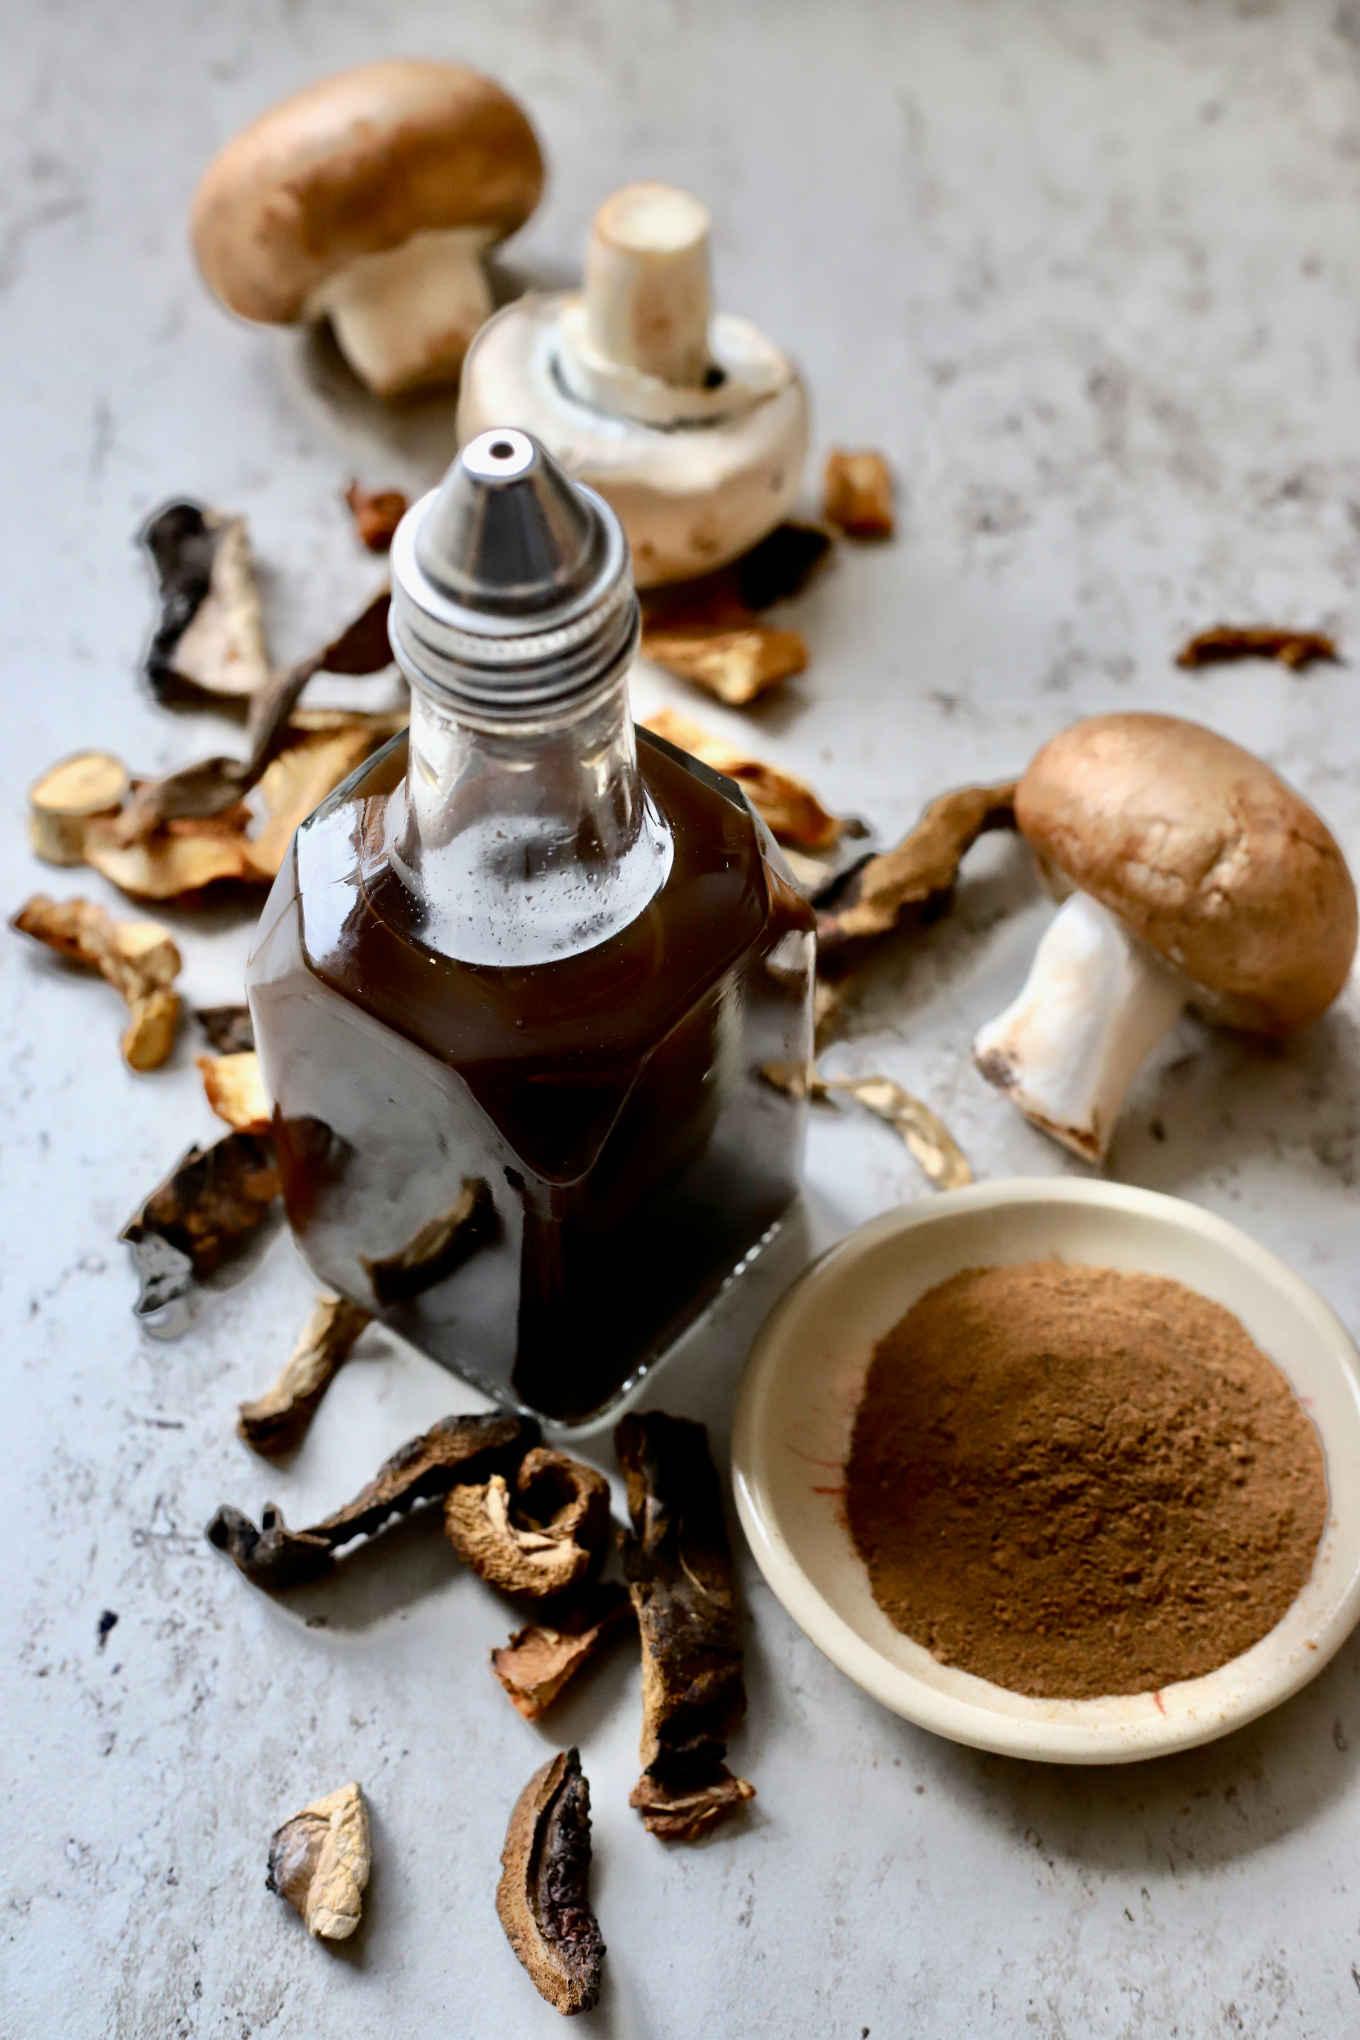 mushroom ketchup and spiced mushroom powder